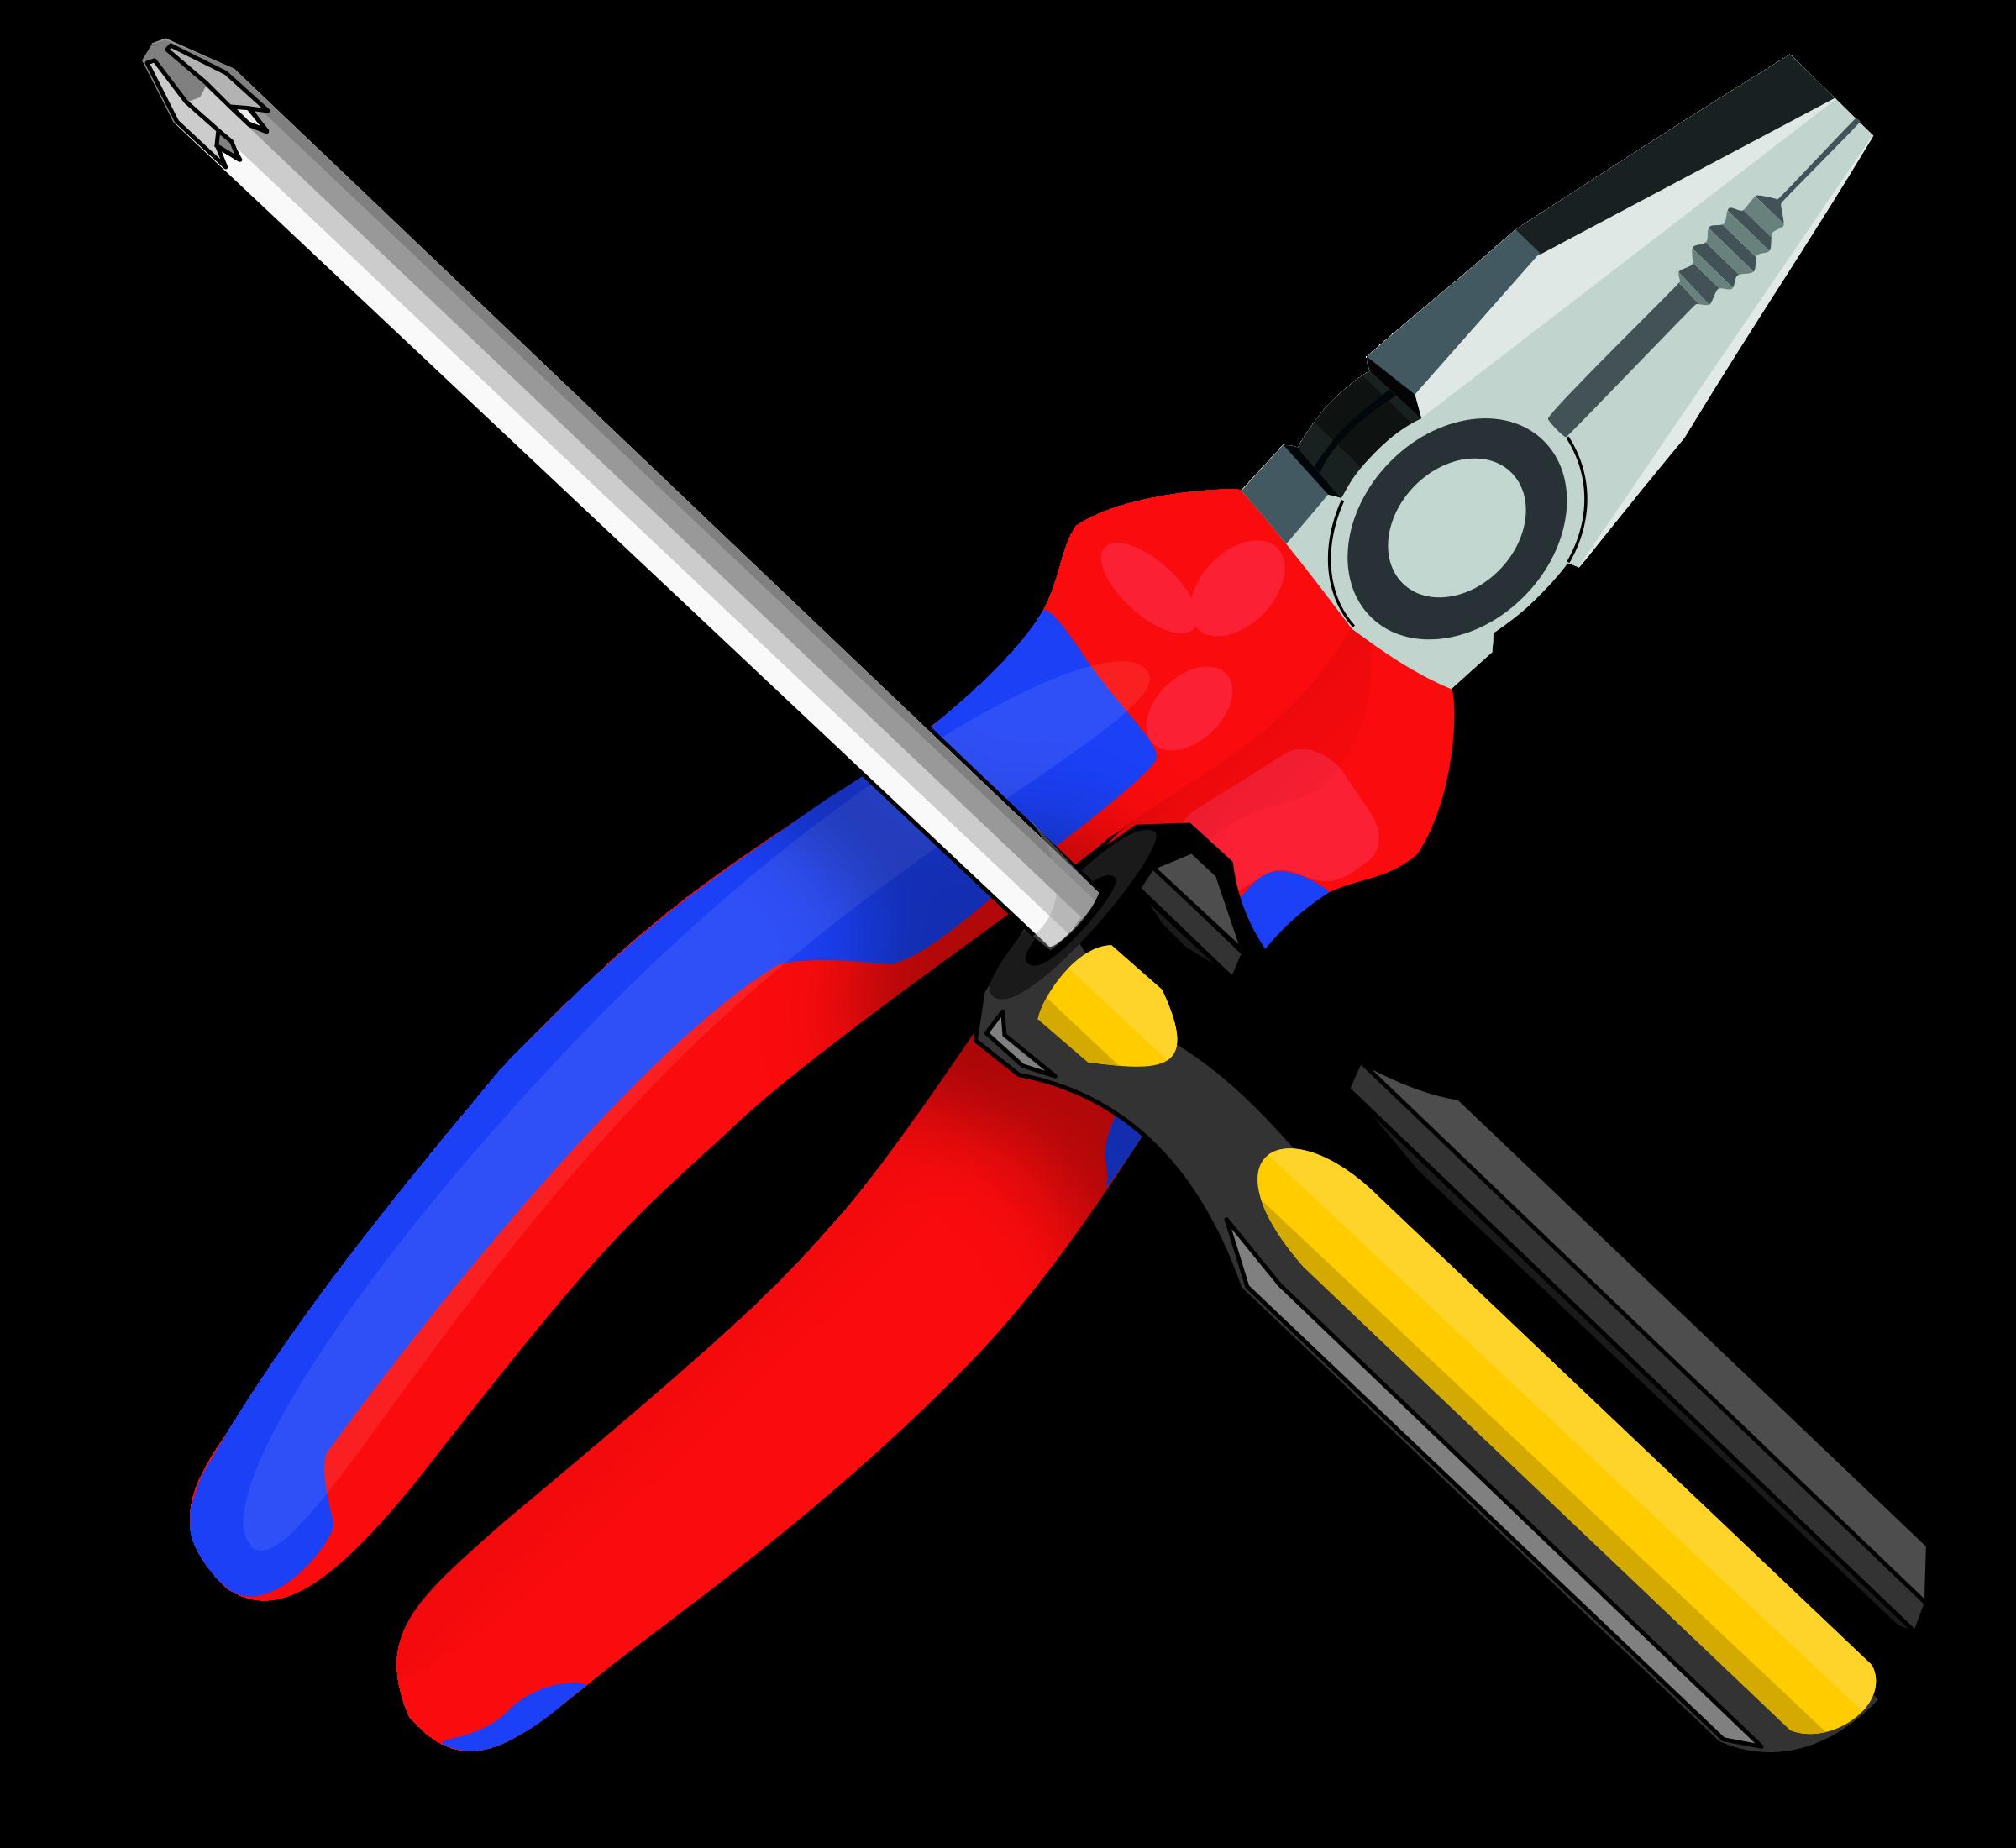 download tools clipart hq png image freepngimg rh freepngimg com tools clip art free tools clipart images